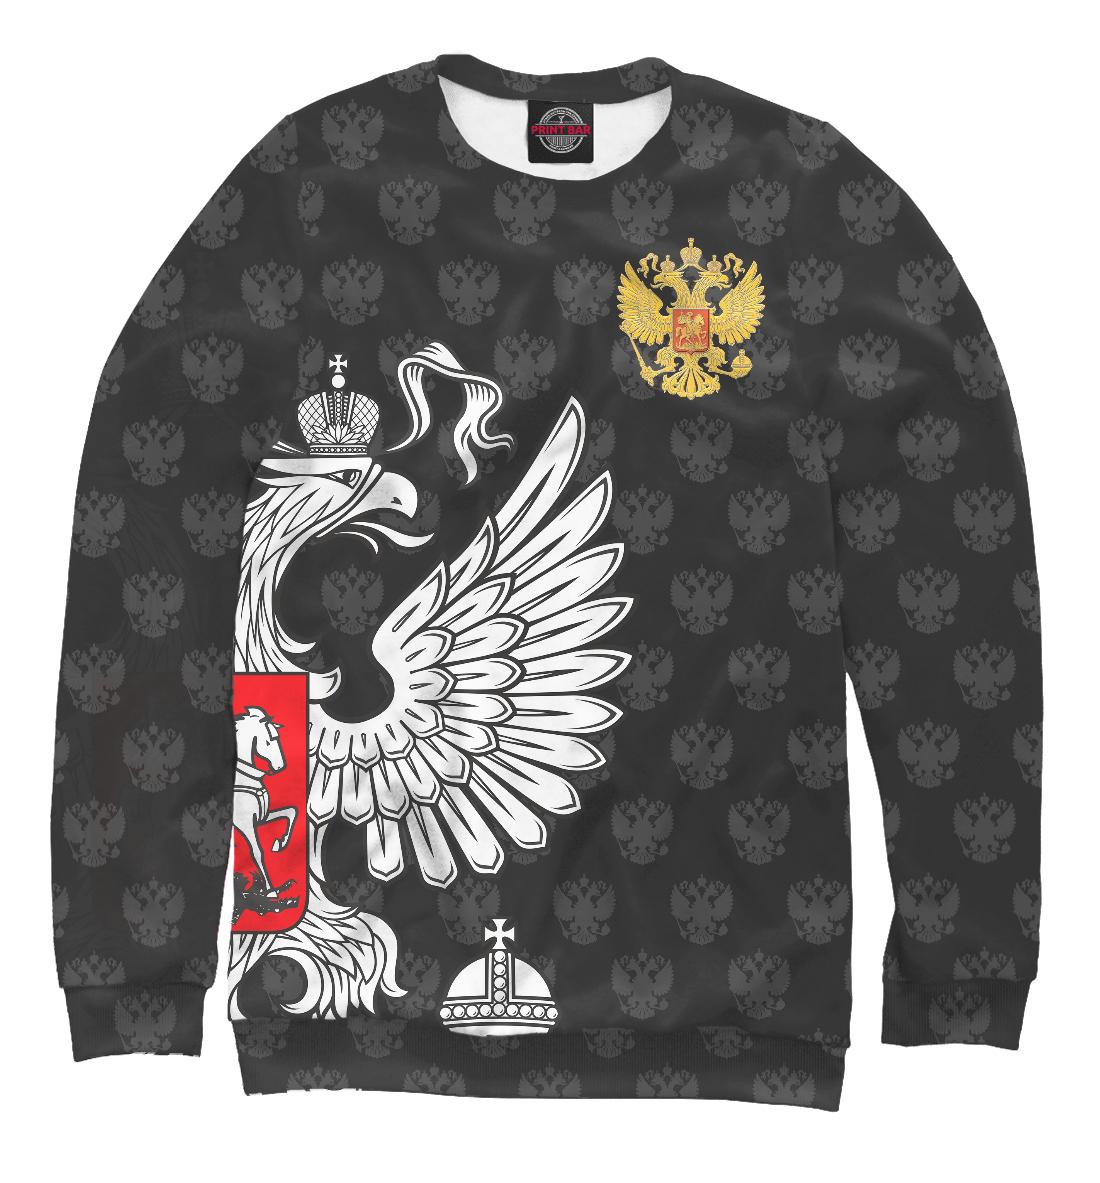 Купить Россия Premium Black, Printbar, Свитшоты, SRF-757837-swi-1